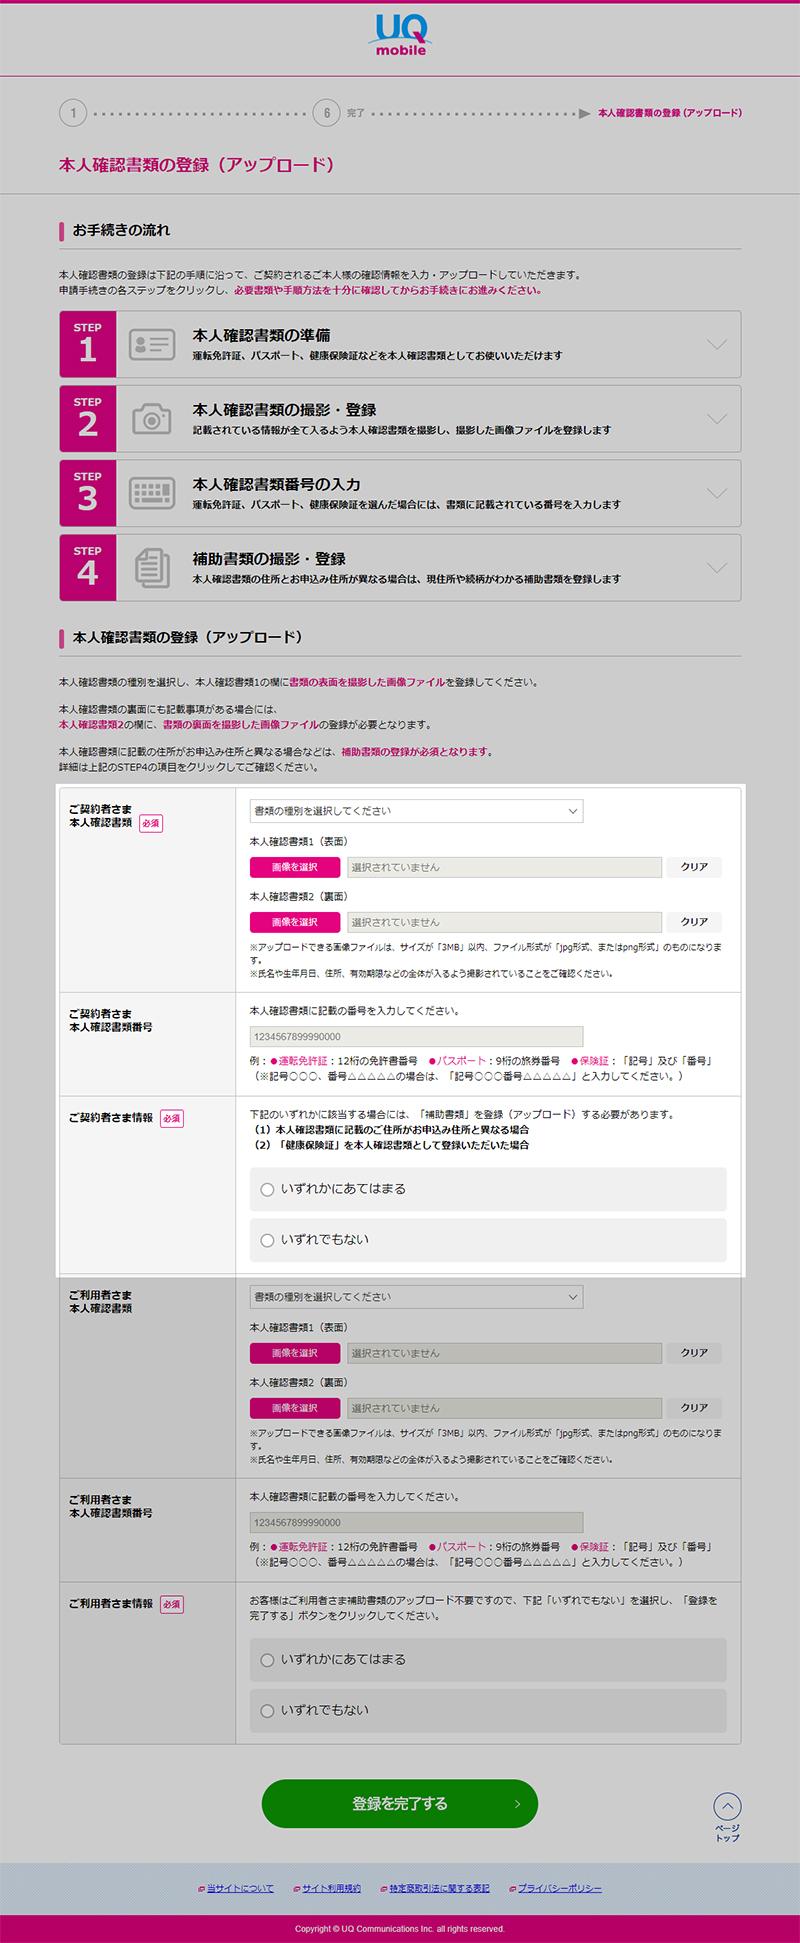 BIGLOBE UQ mobileエントリーパッケージの申込み